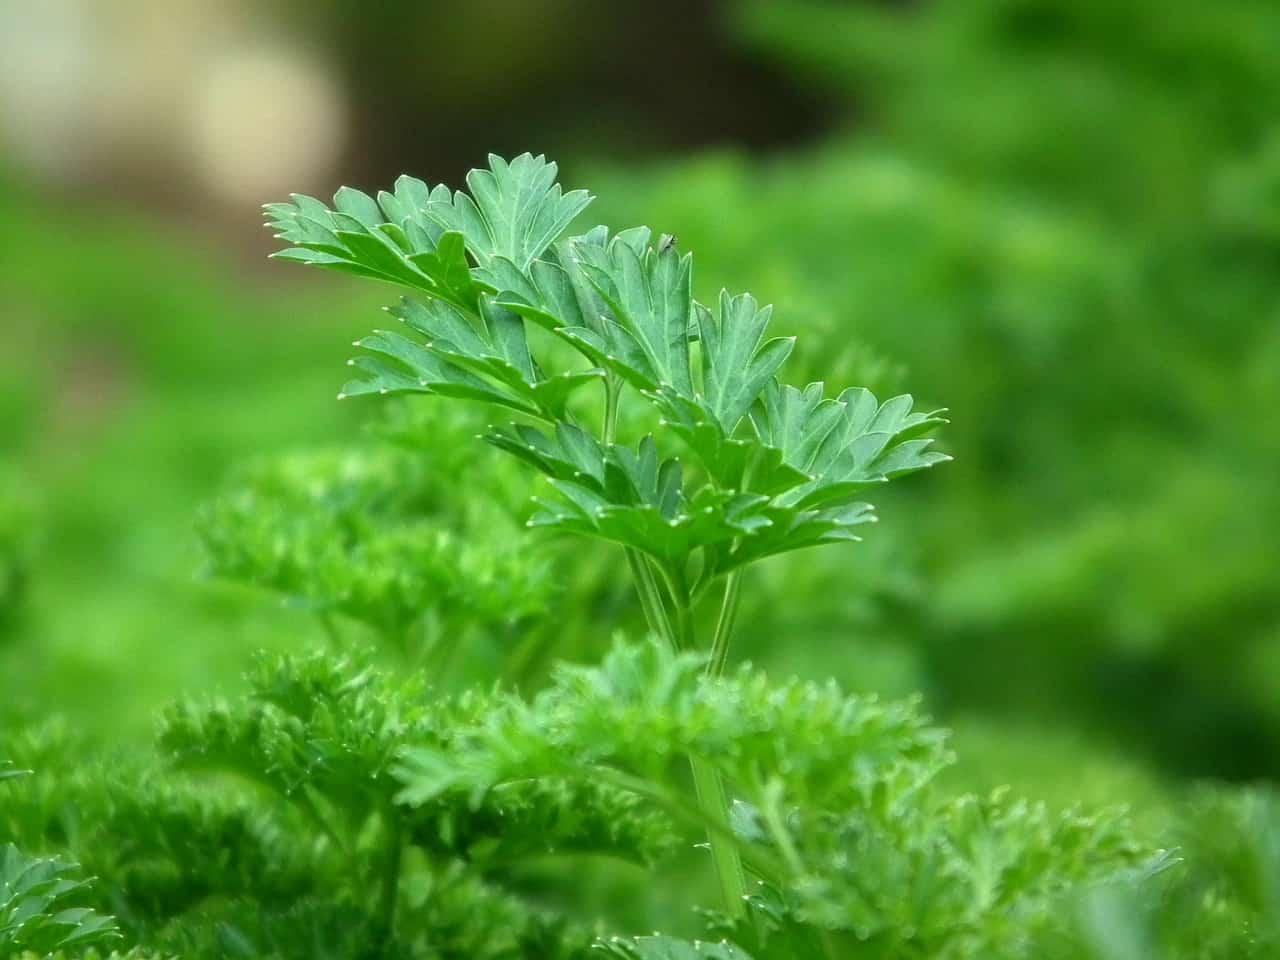 Parsley plant.